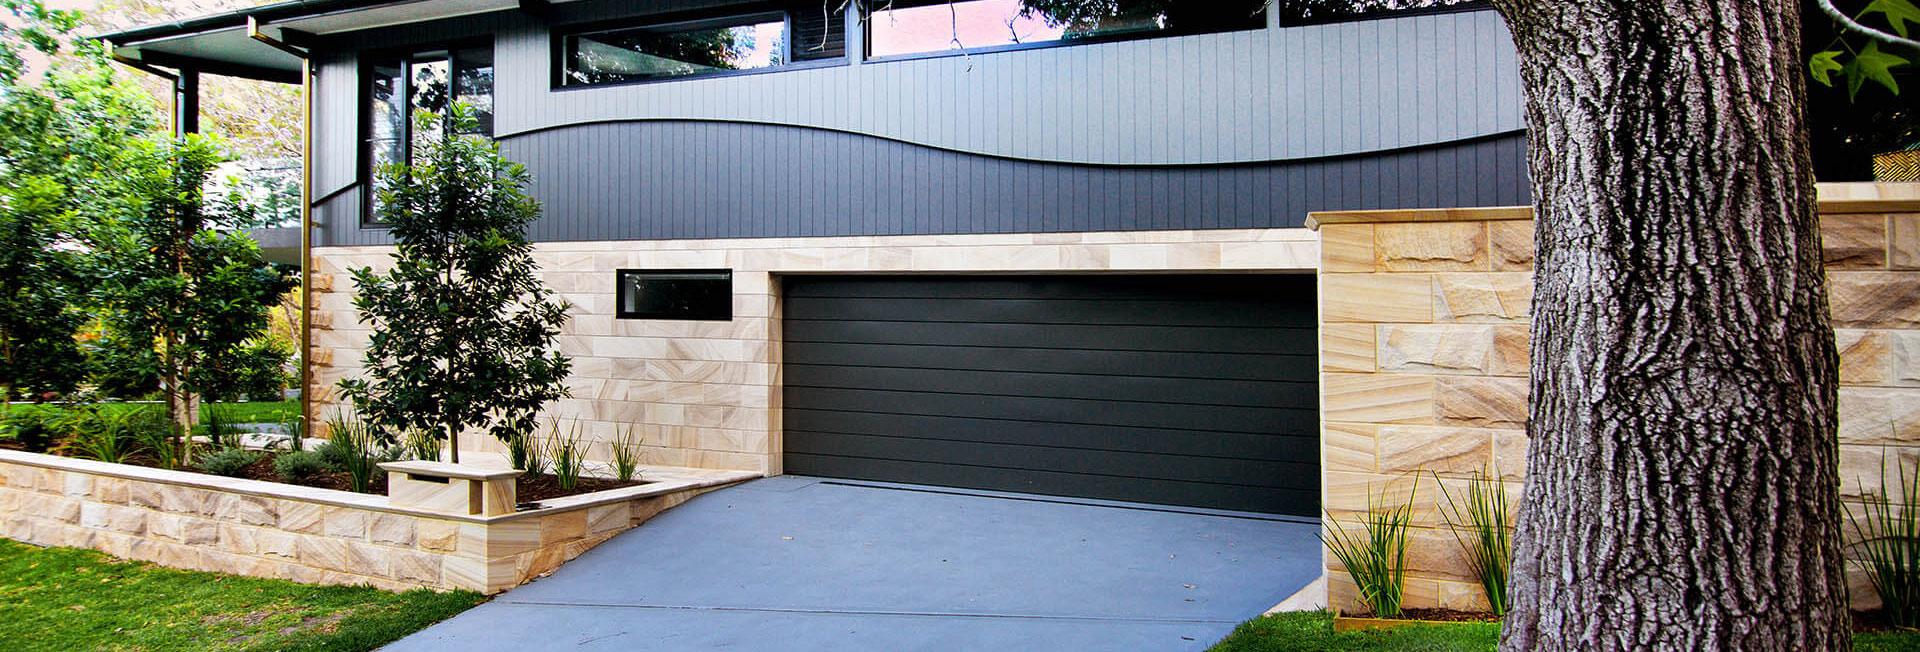 Tiling Services by Astute Tiling Sydney